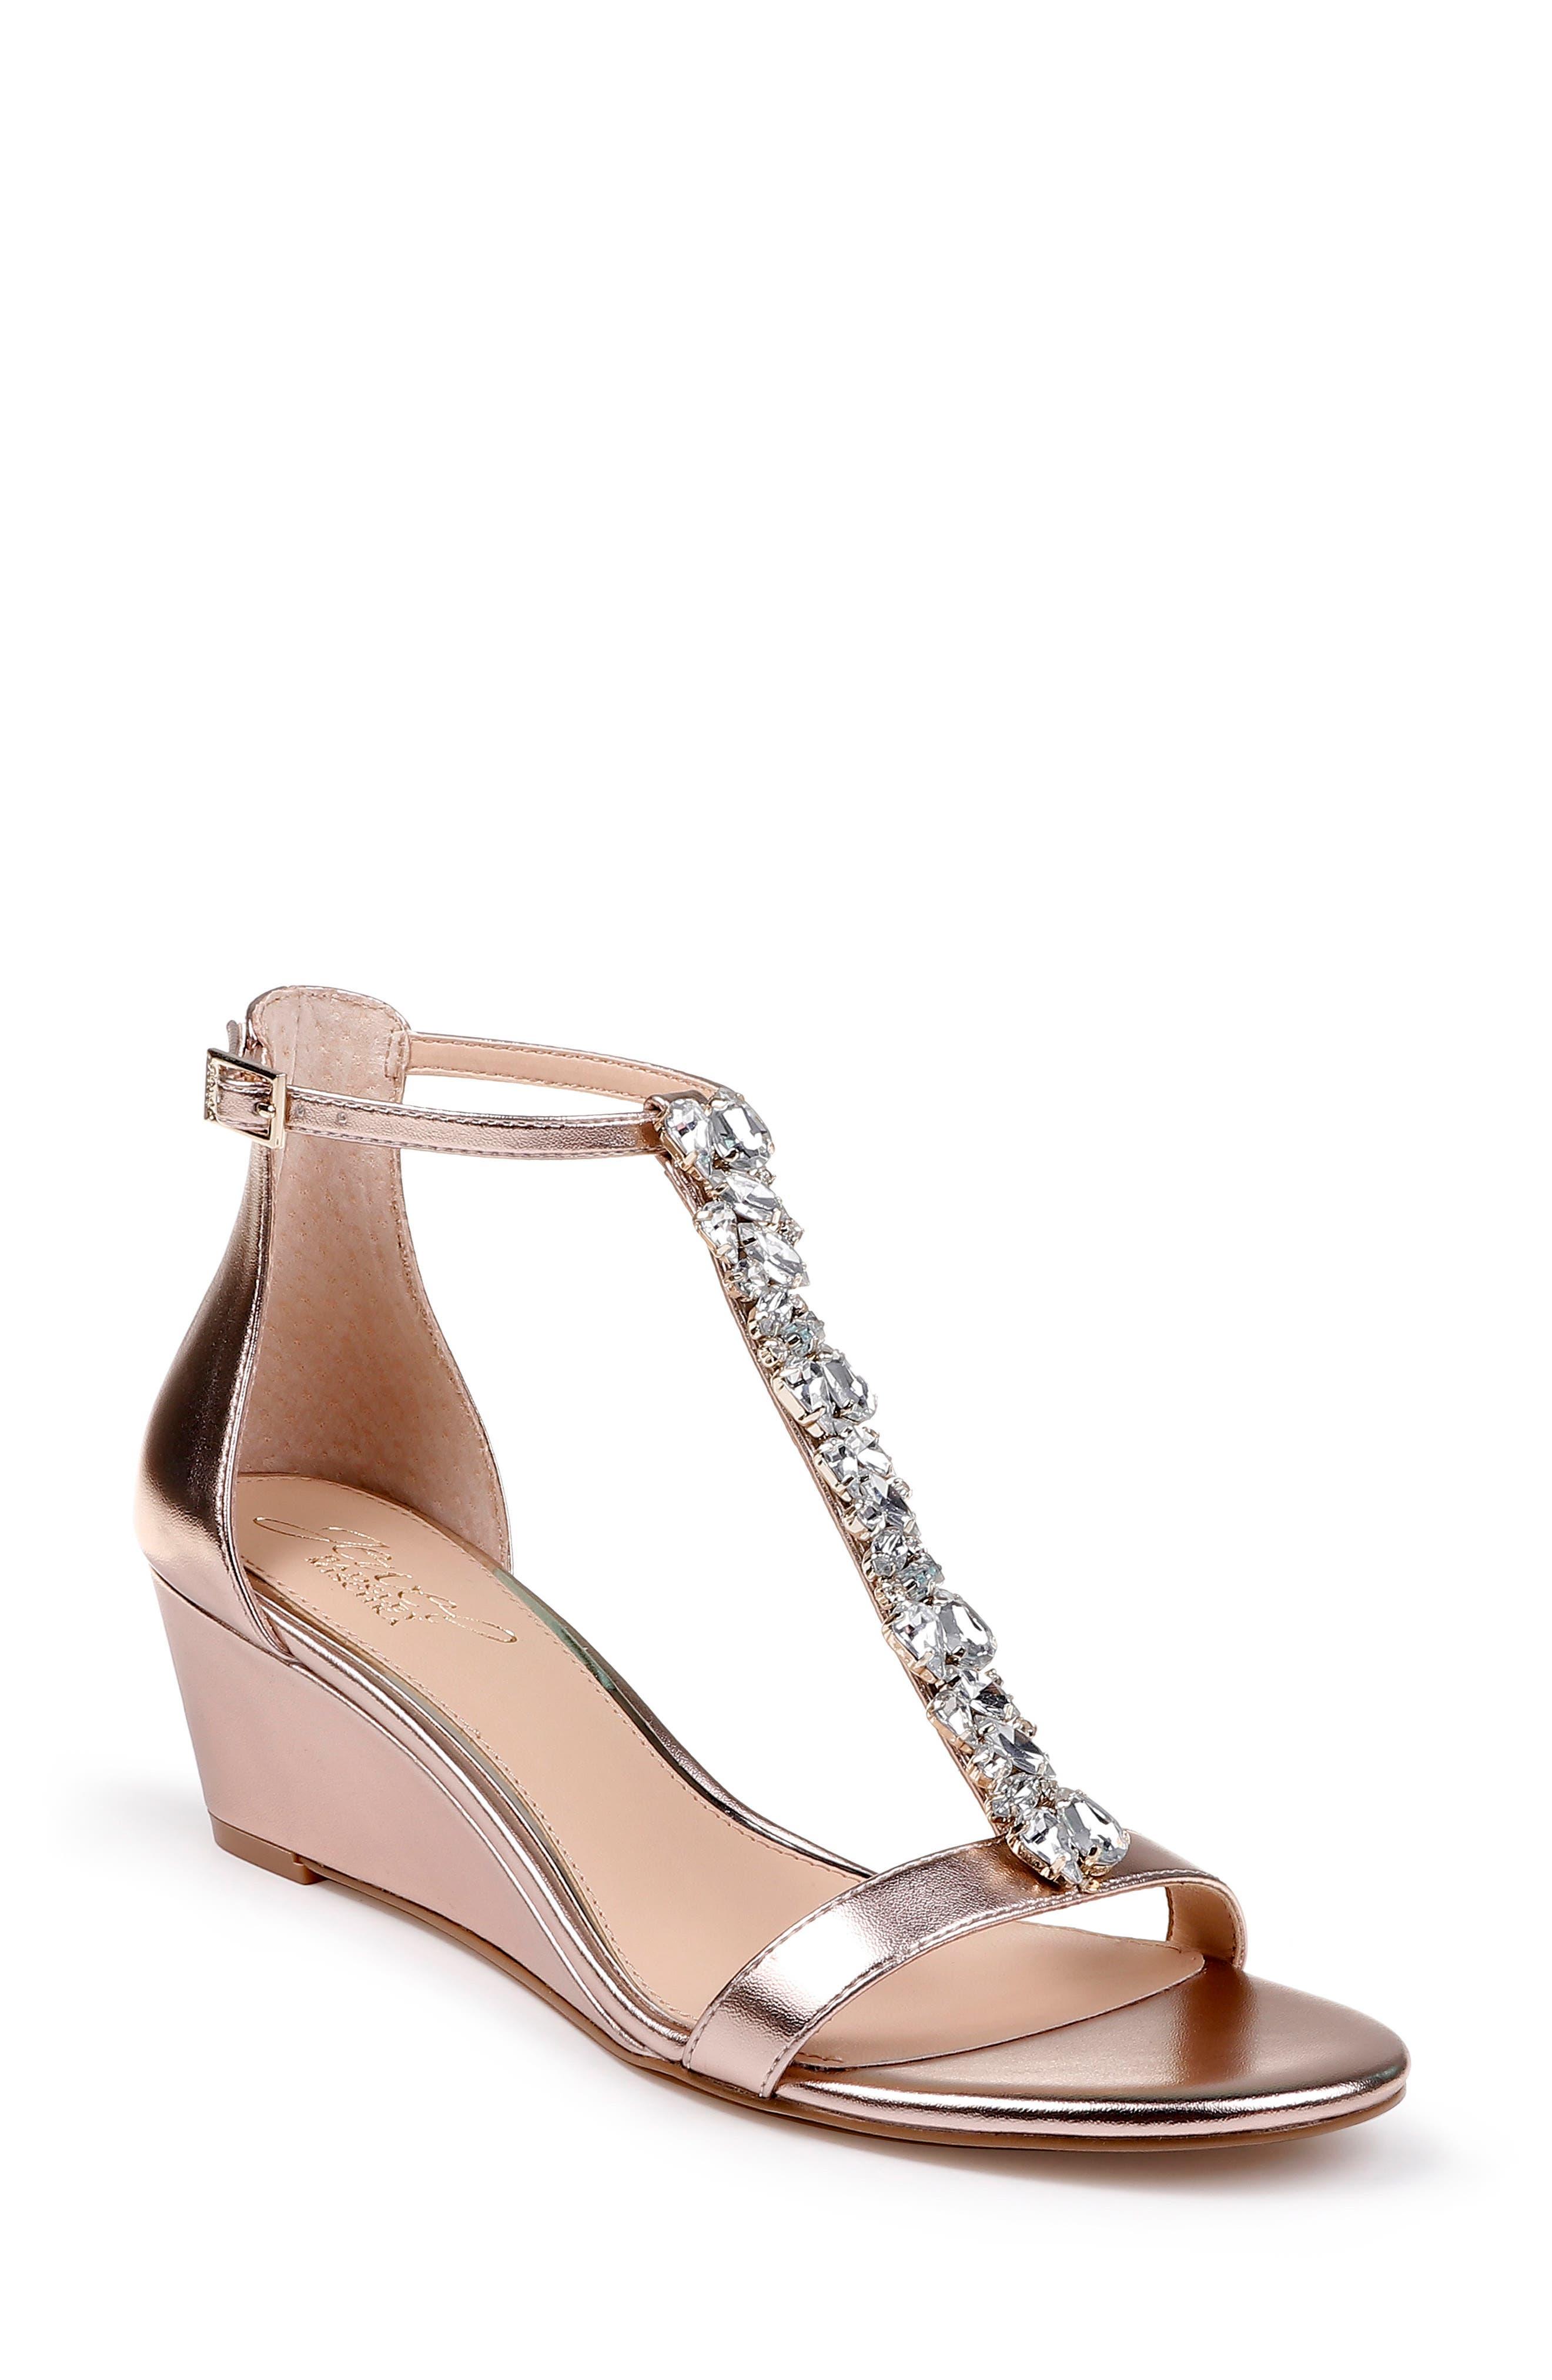 JEWEL BADGLEY MISCHKA Darrell Embellished Wedge Sandal, Main, color, ROSE GOLD NAPPA